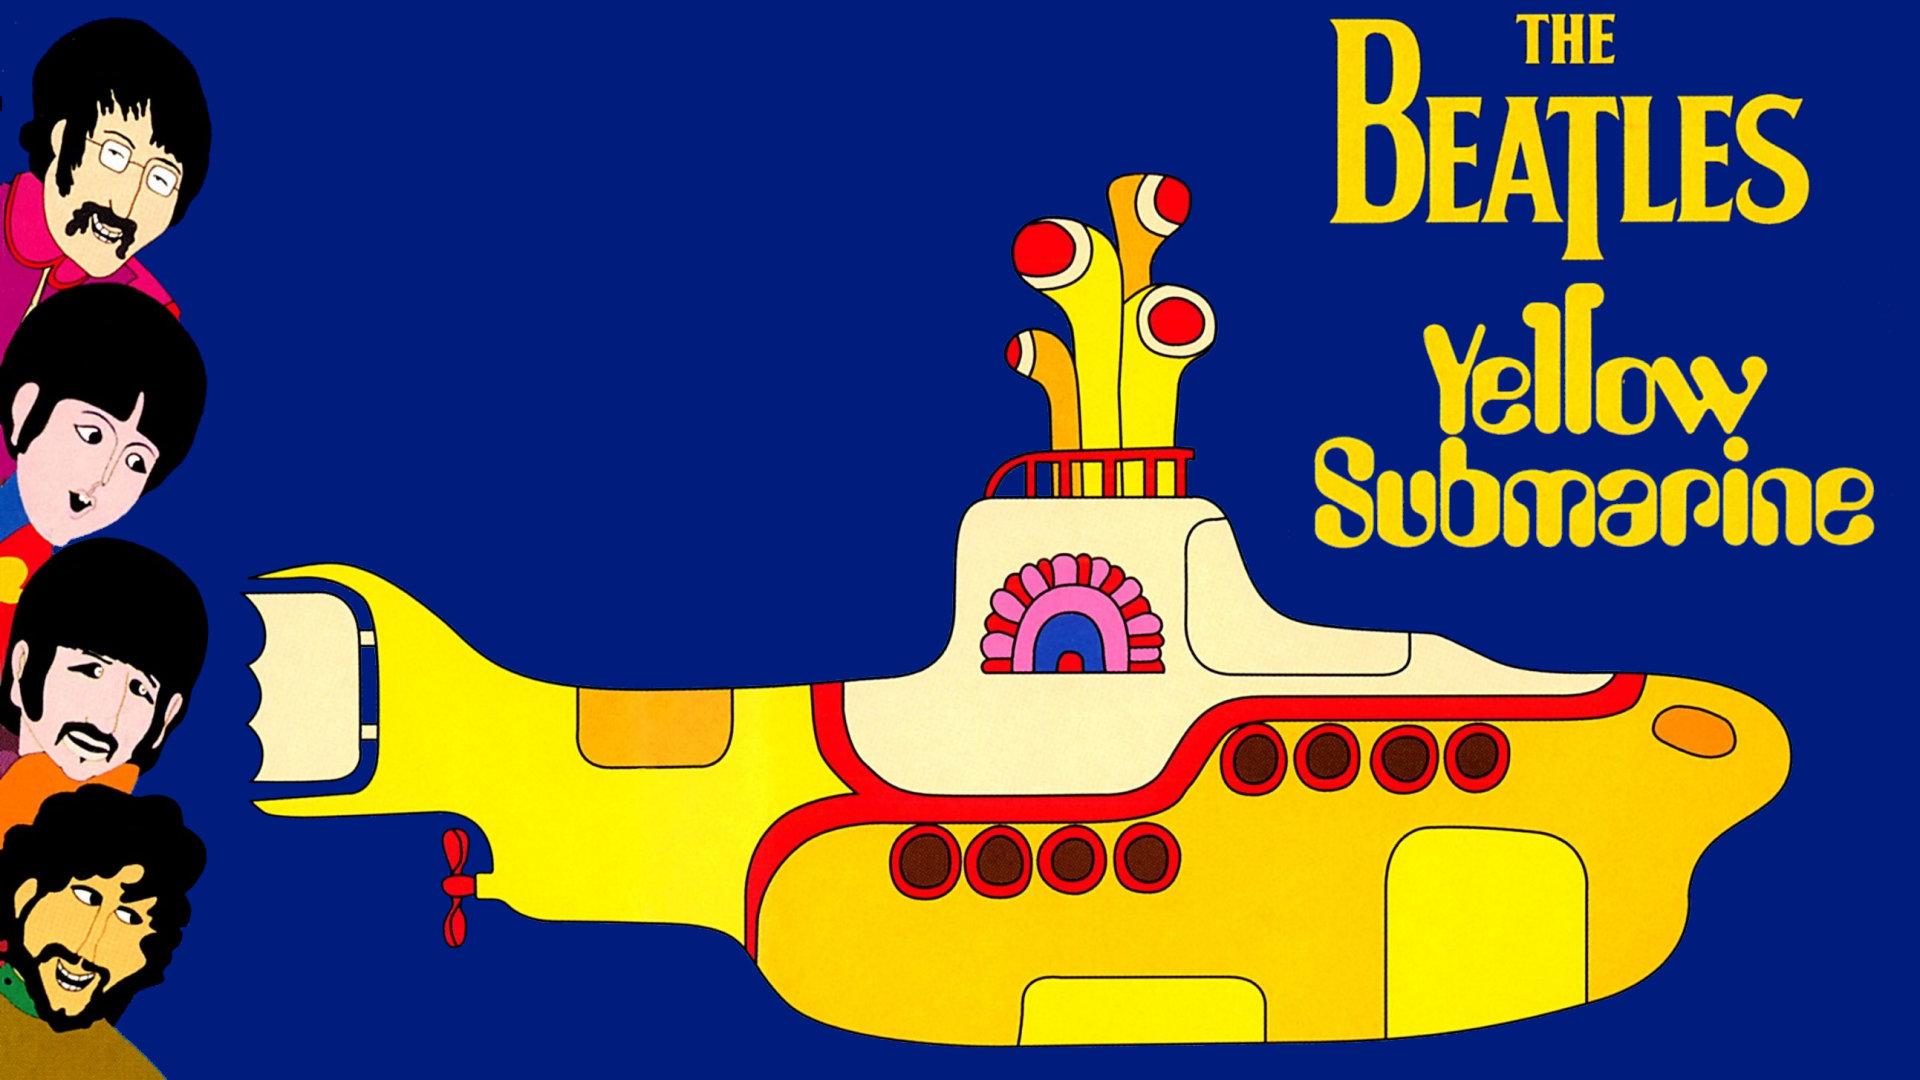 Beatles Yellow Submarine fumetto